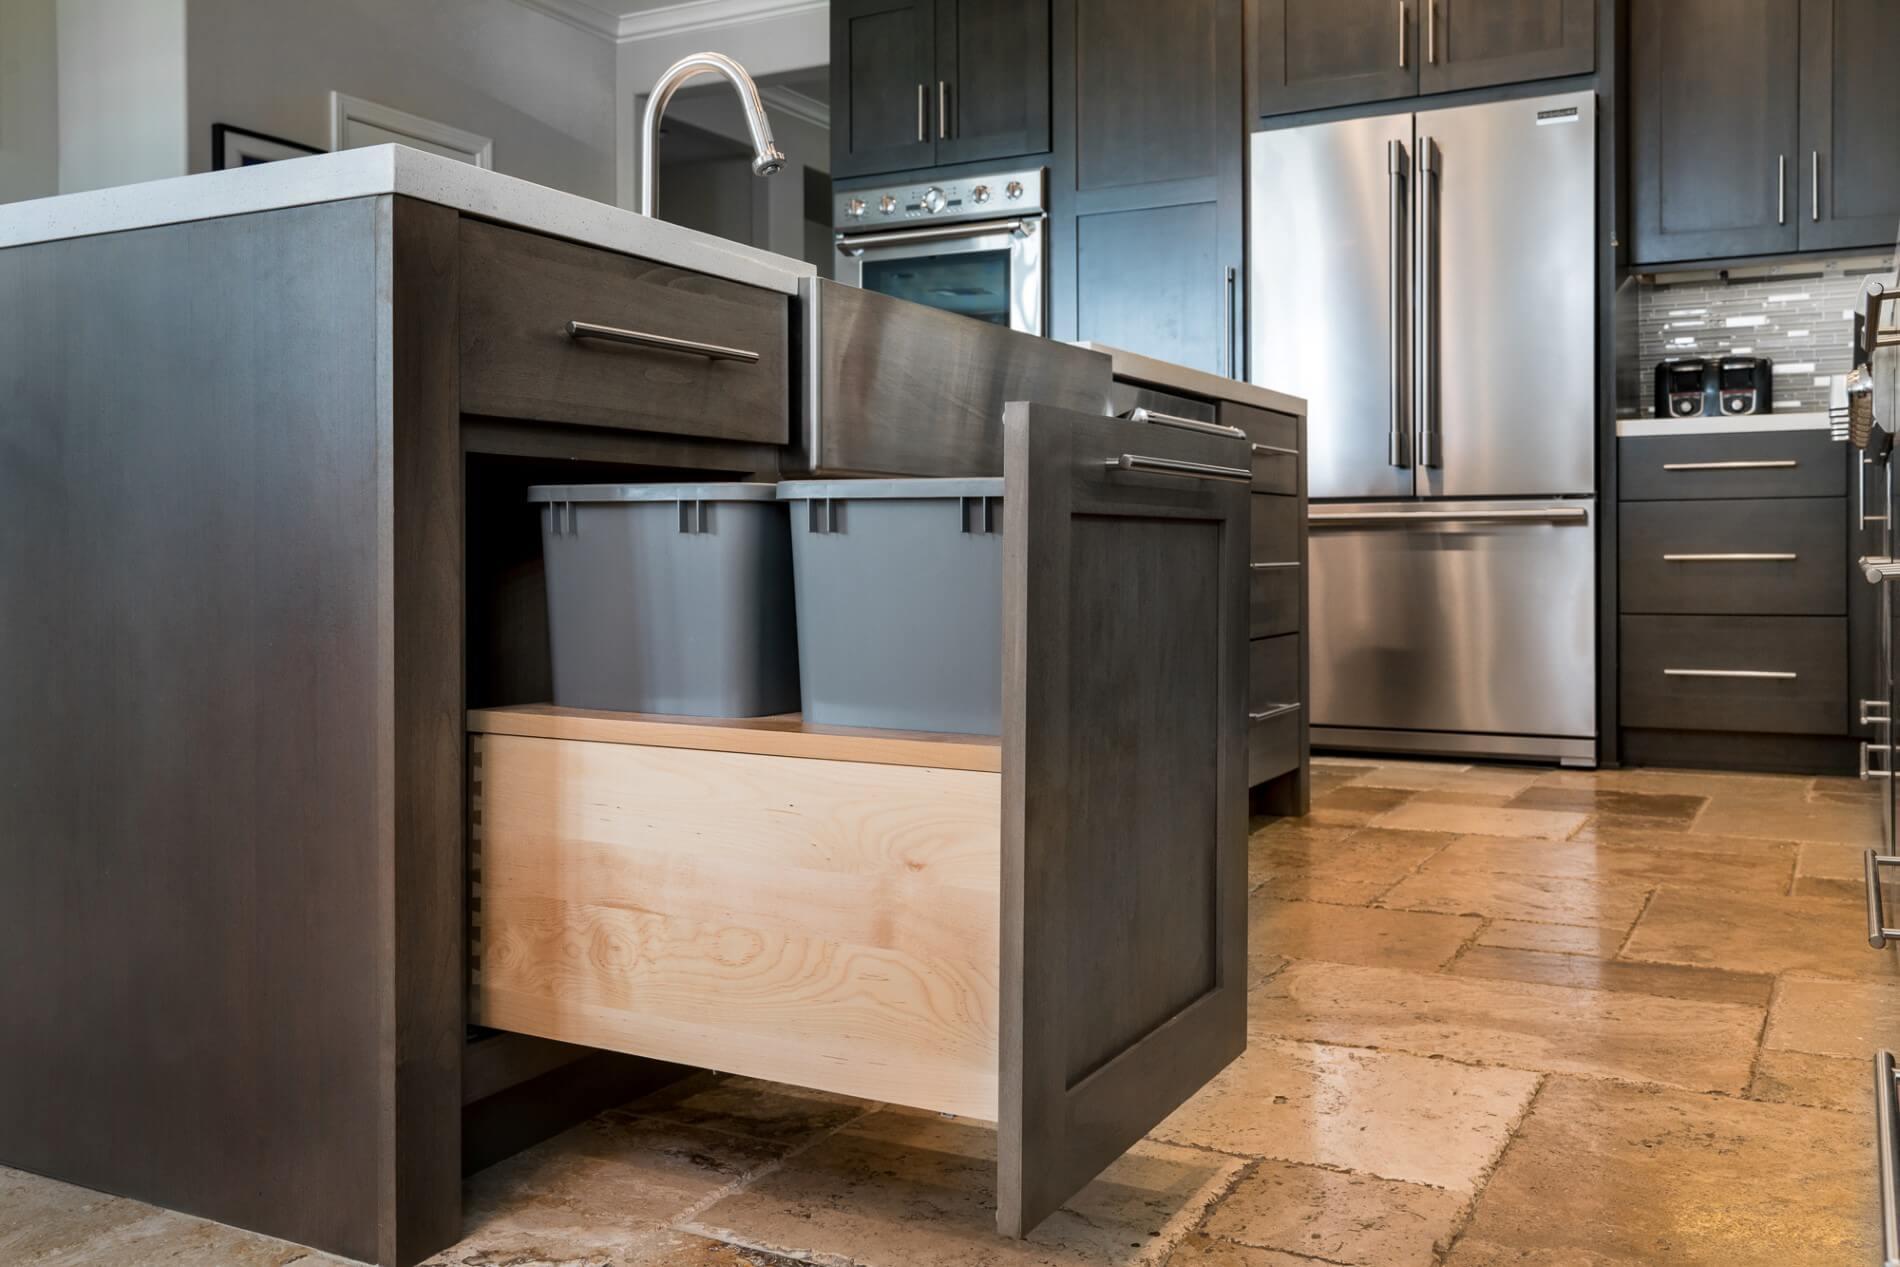 Double Trash Pull Out, Custom Kitchen Design, Modern Kitchen Remodel Orange County